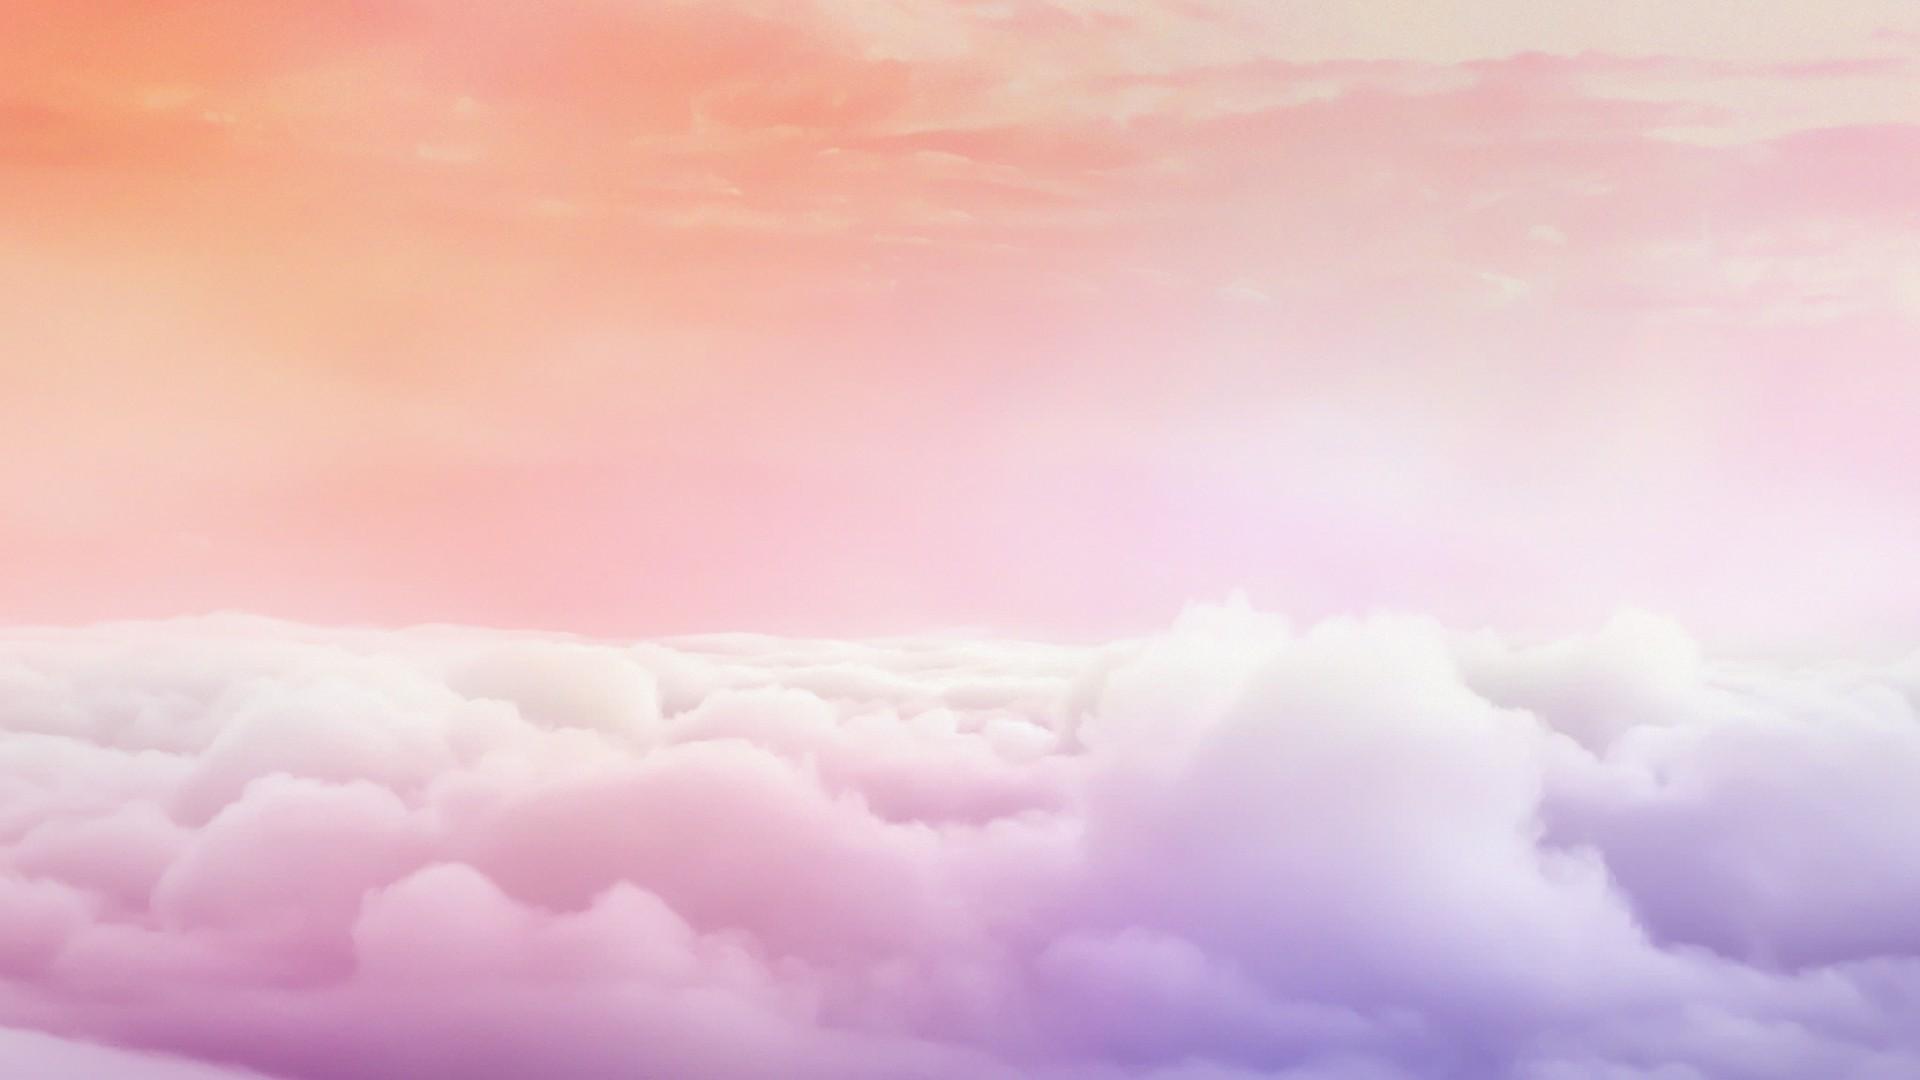 Pink Cloud Free Wallpaper